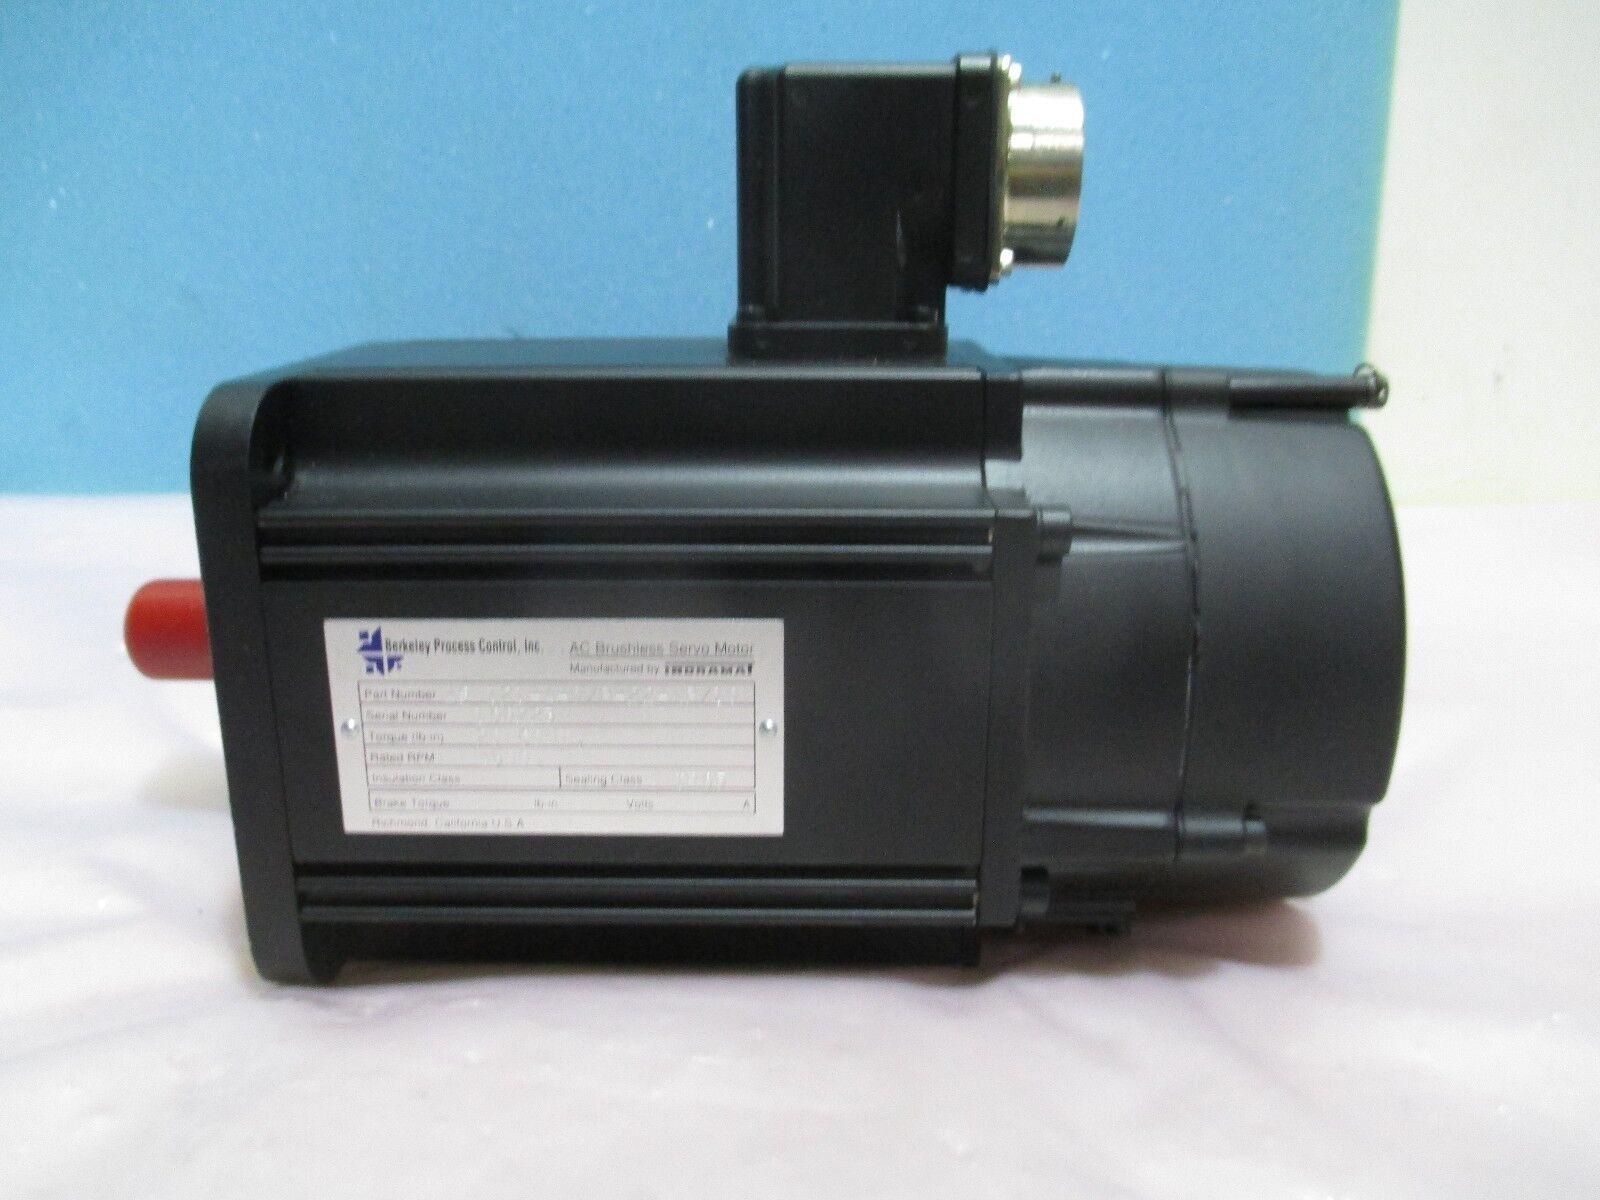 Berkeley Process Control ASM121-A-0/B-22-NB/10 AC Brushless Servo Motor, 421590